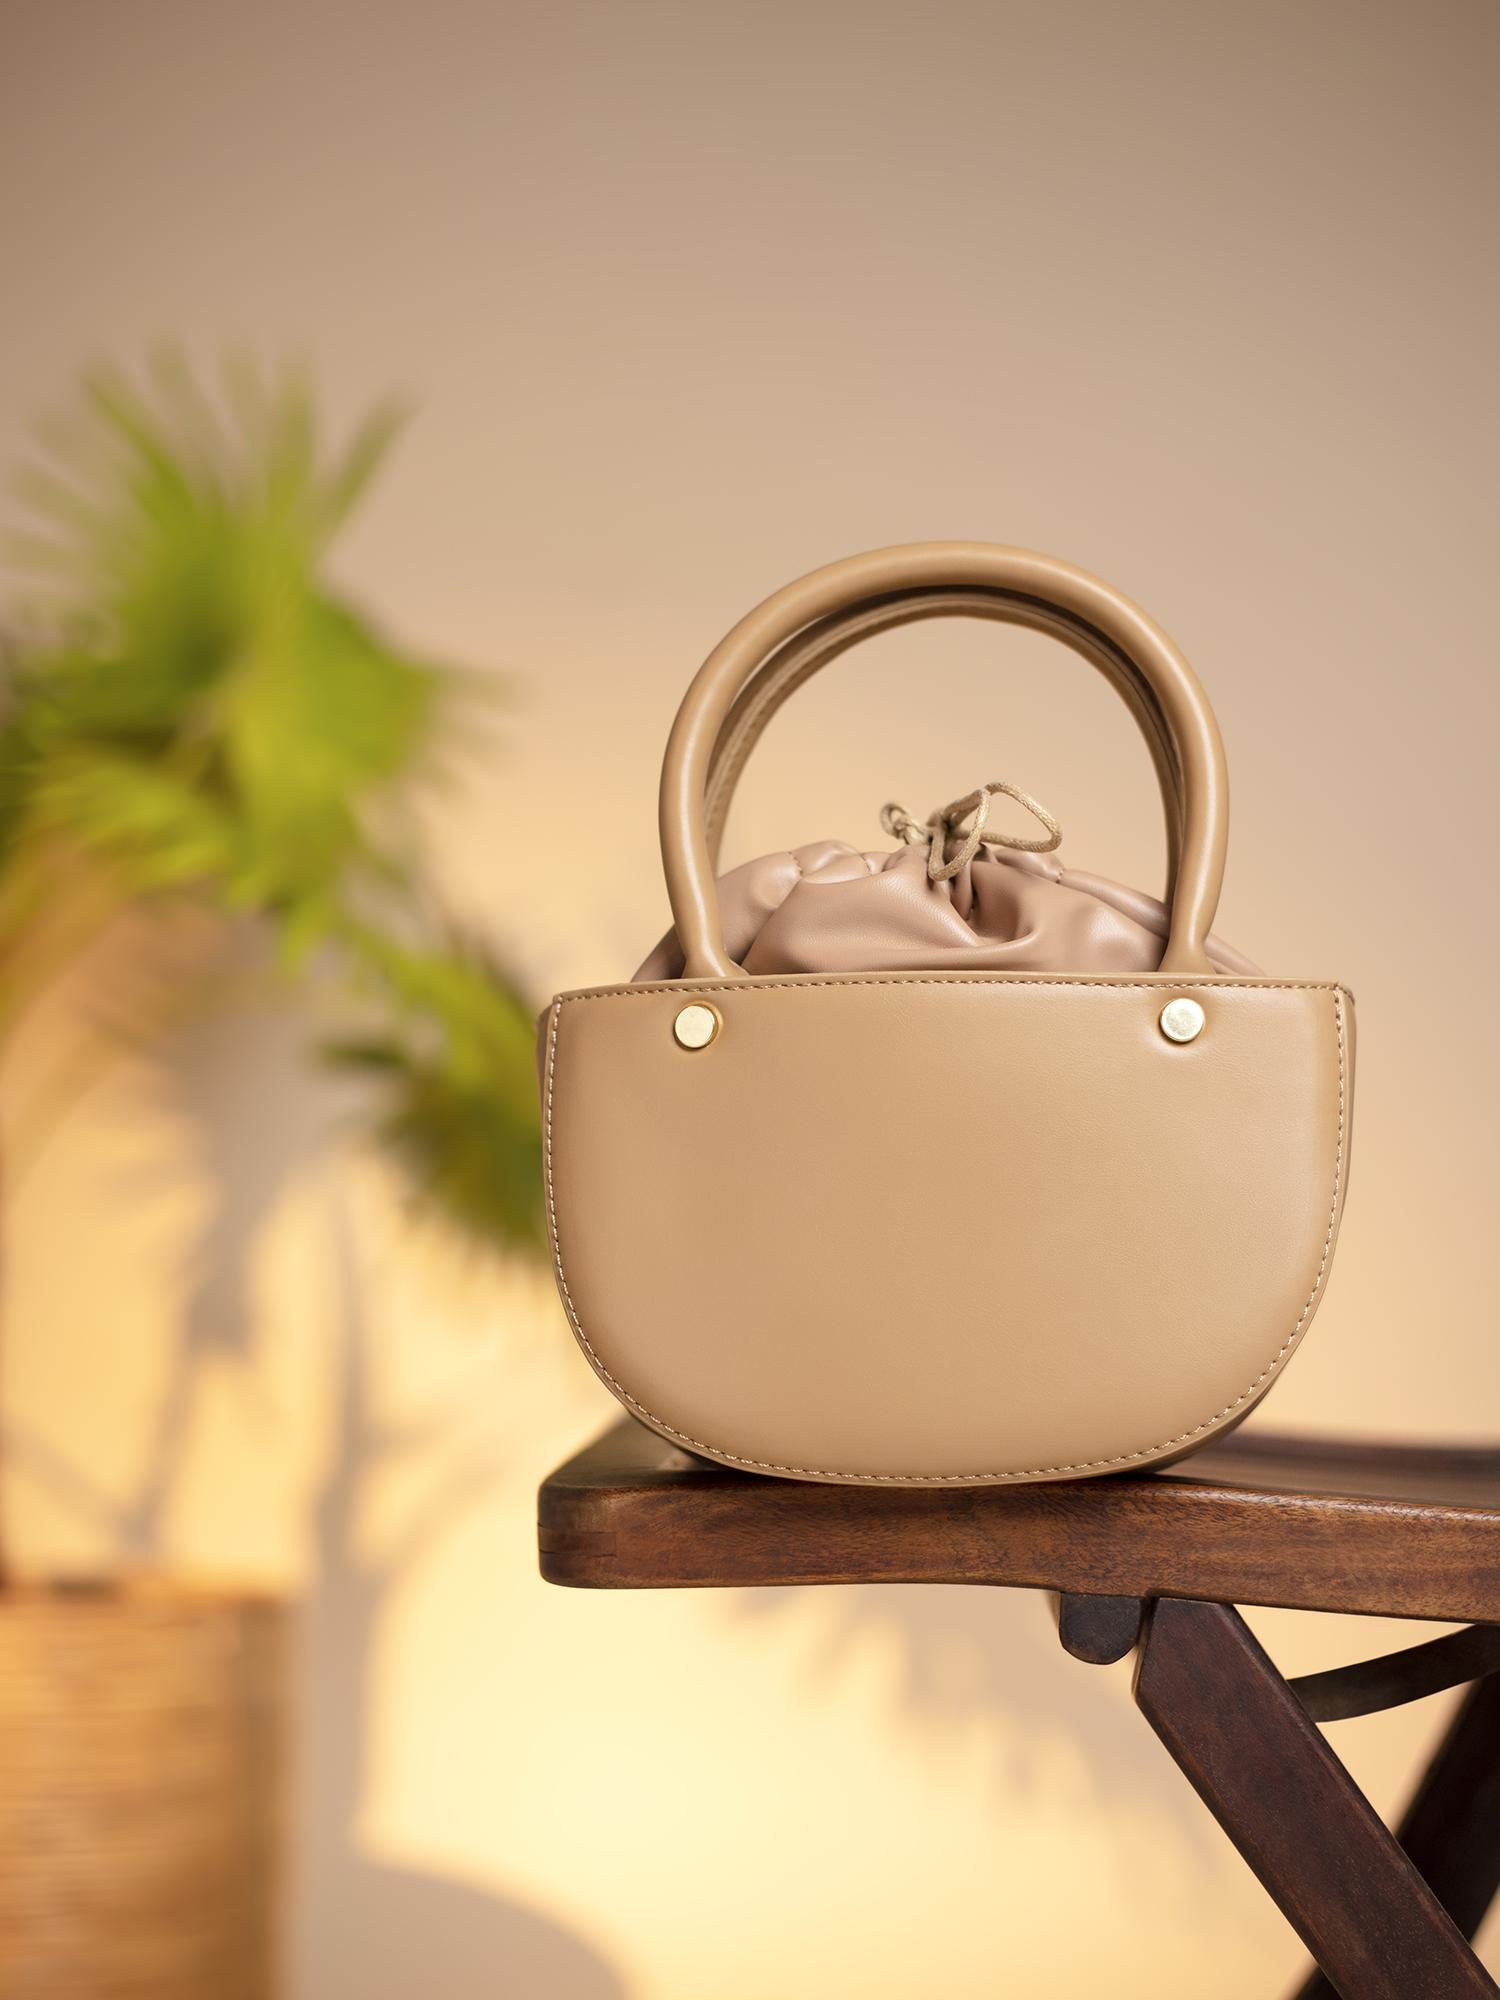 Slings-Tan Back To The Classics  Bag1